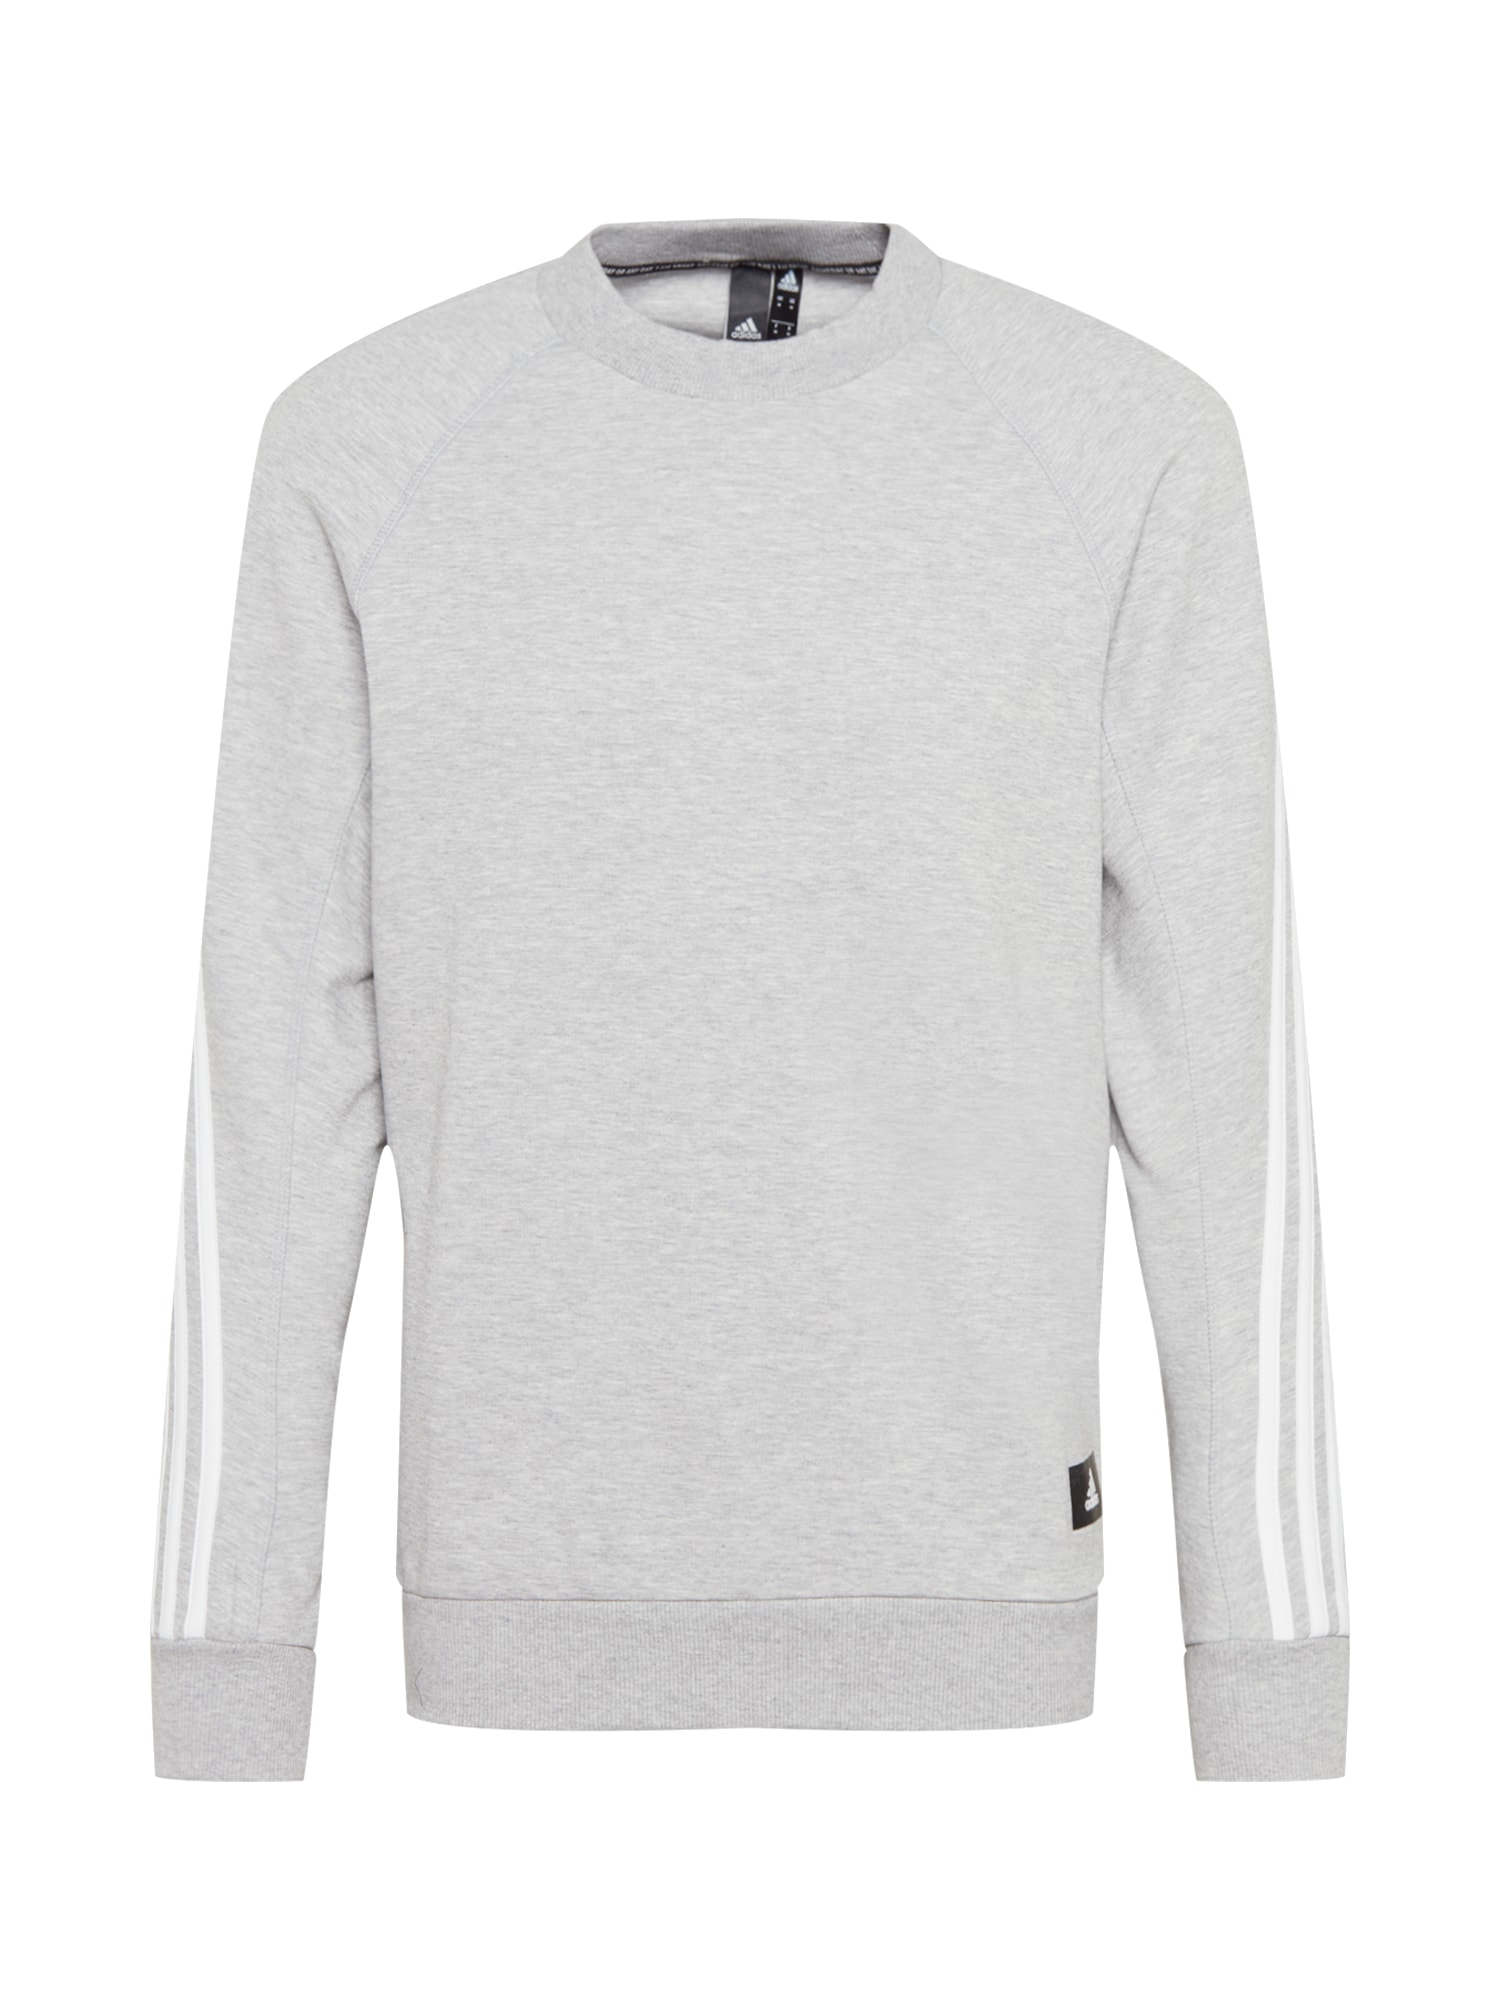 ADIDAS PERFORMANCE Sportinio tipo megztinis margai pilka / balta / juoda